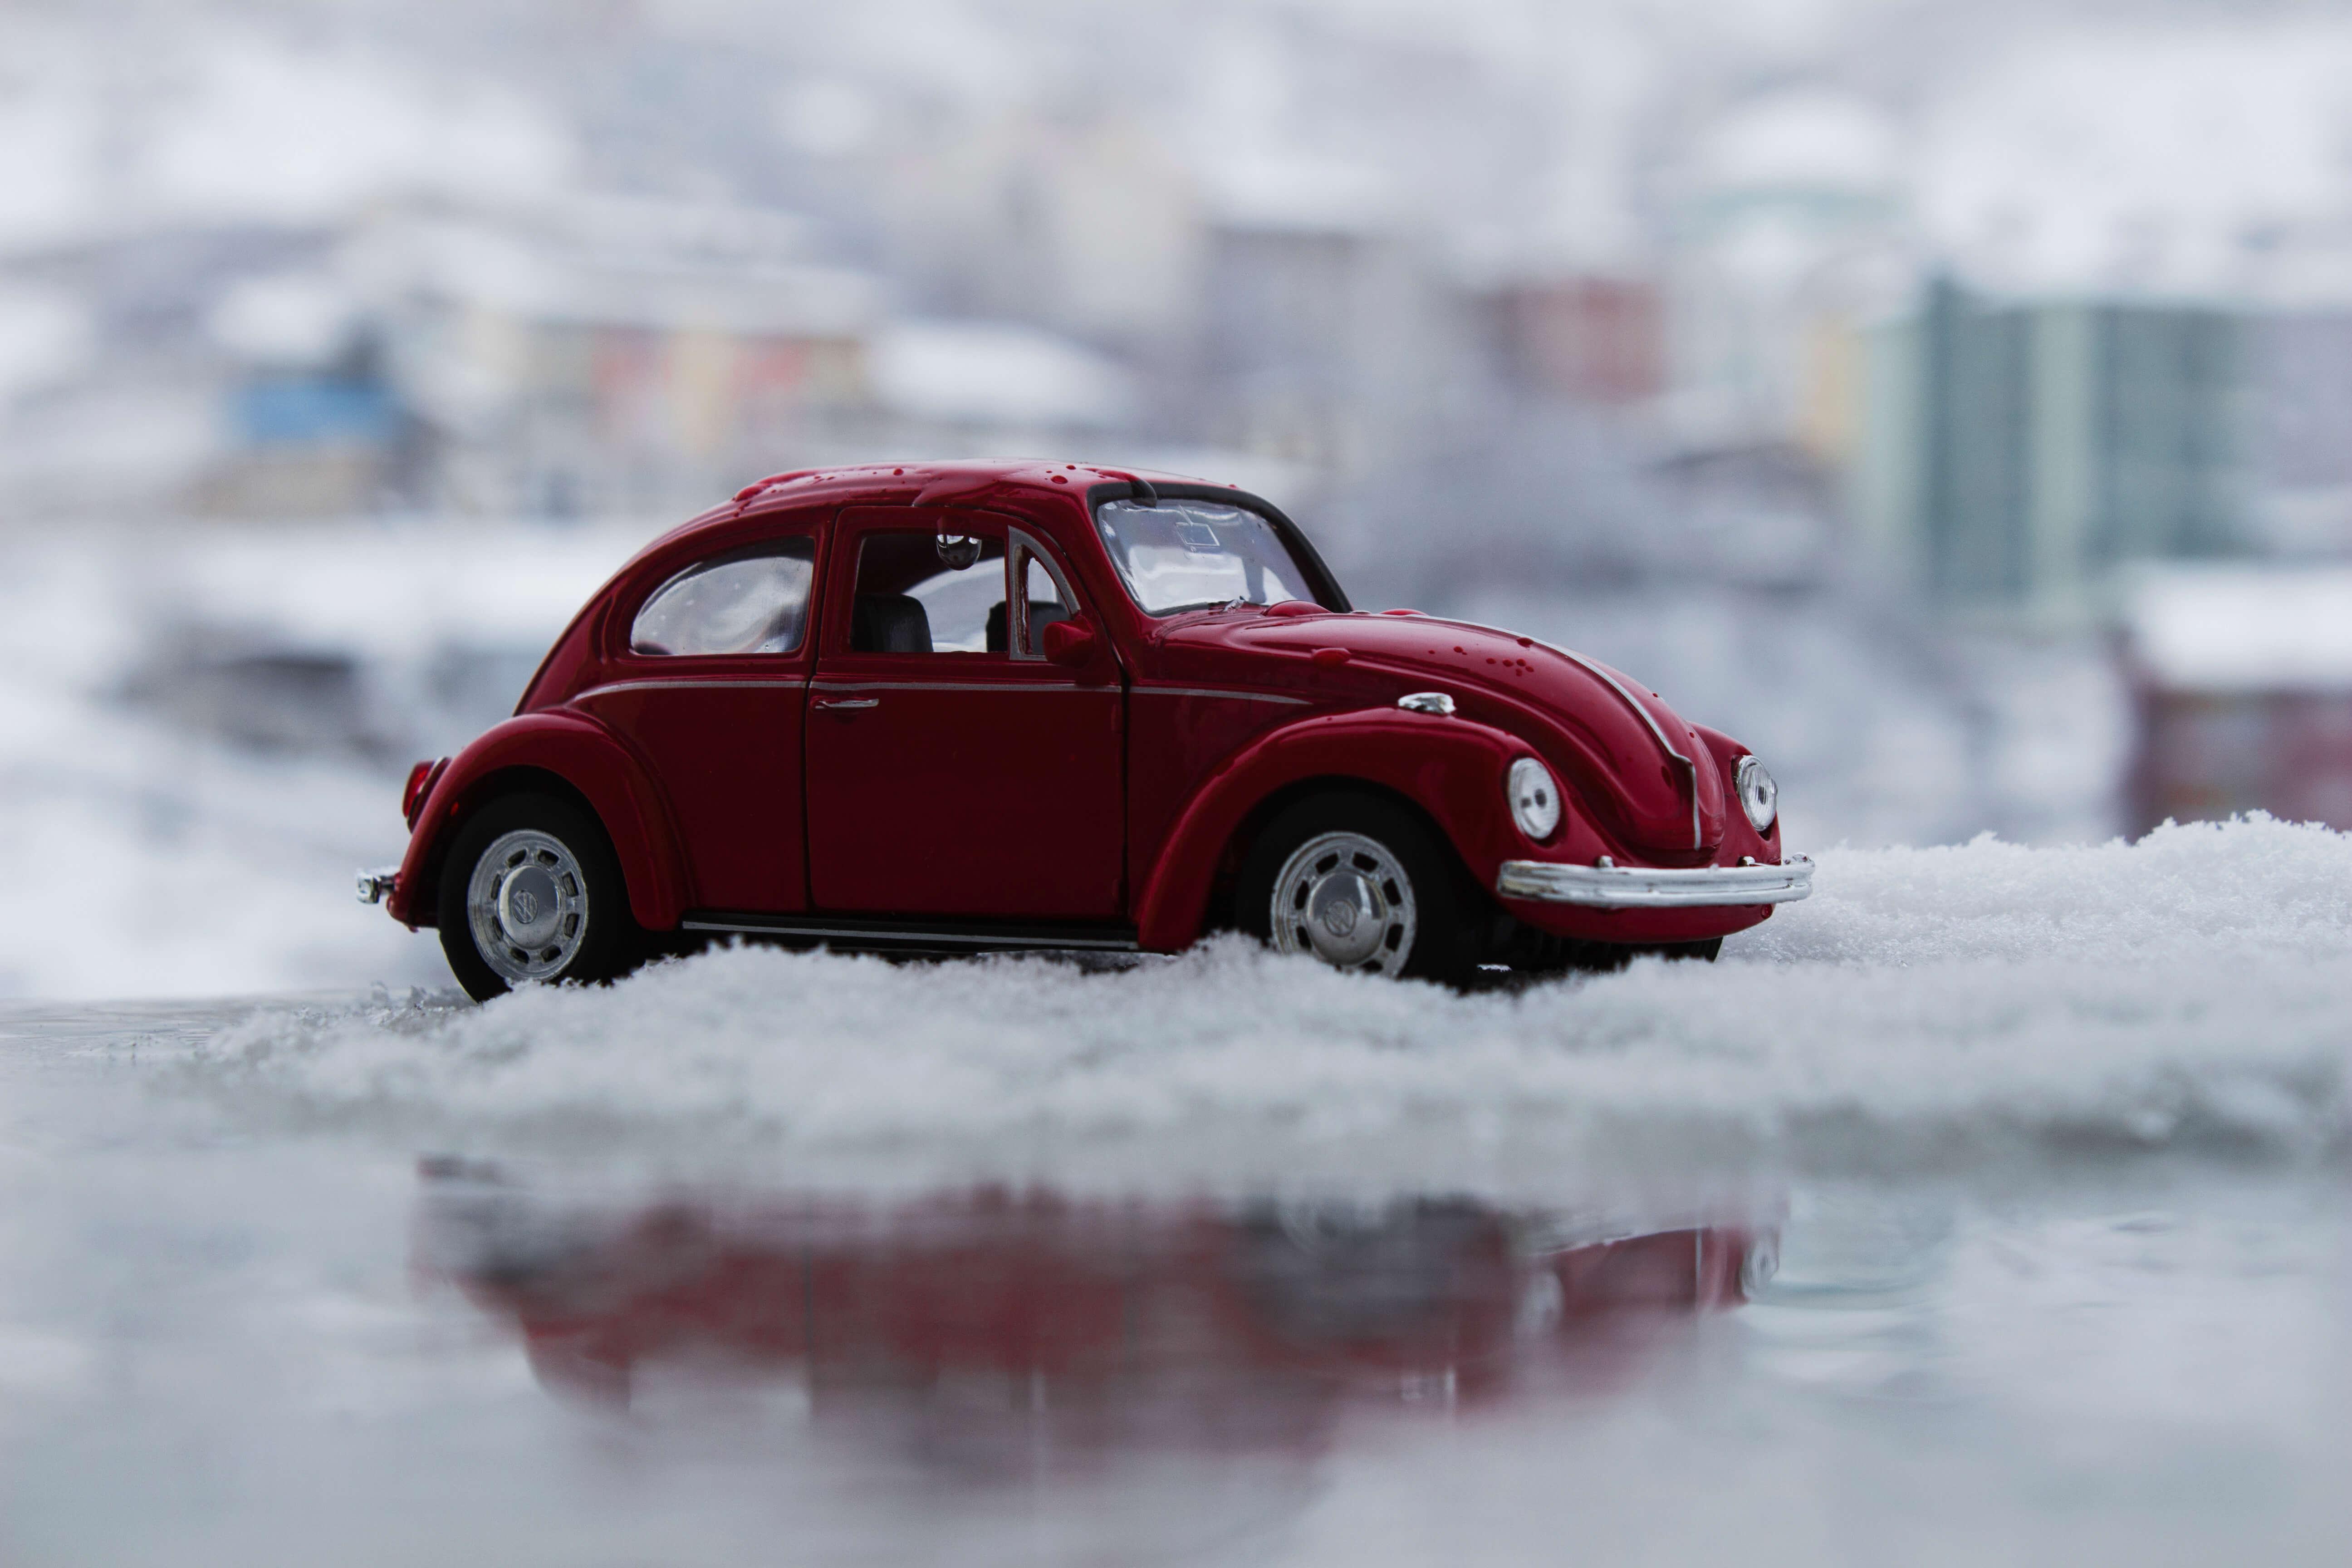 Winter car breakdowns snowed under car